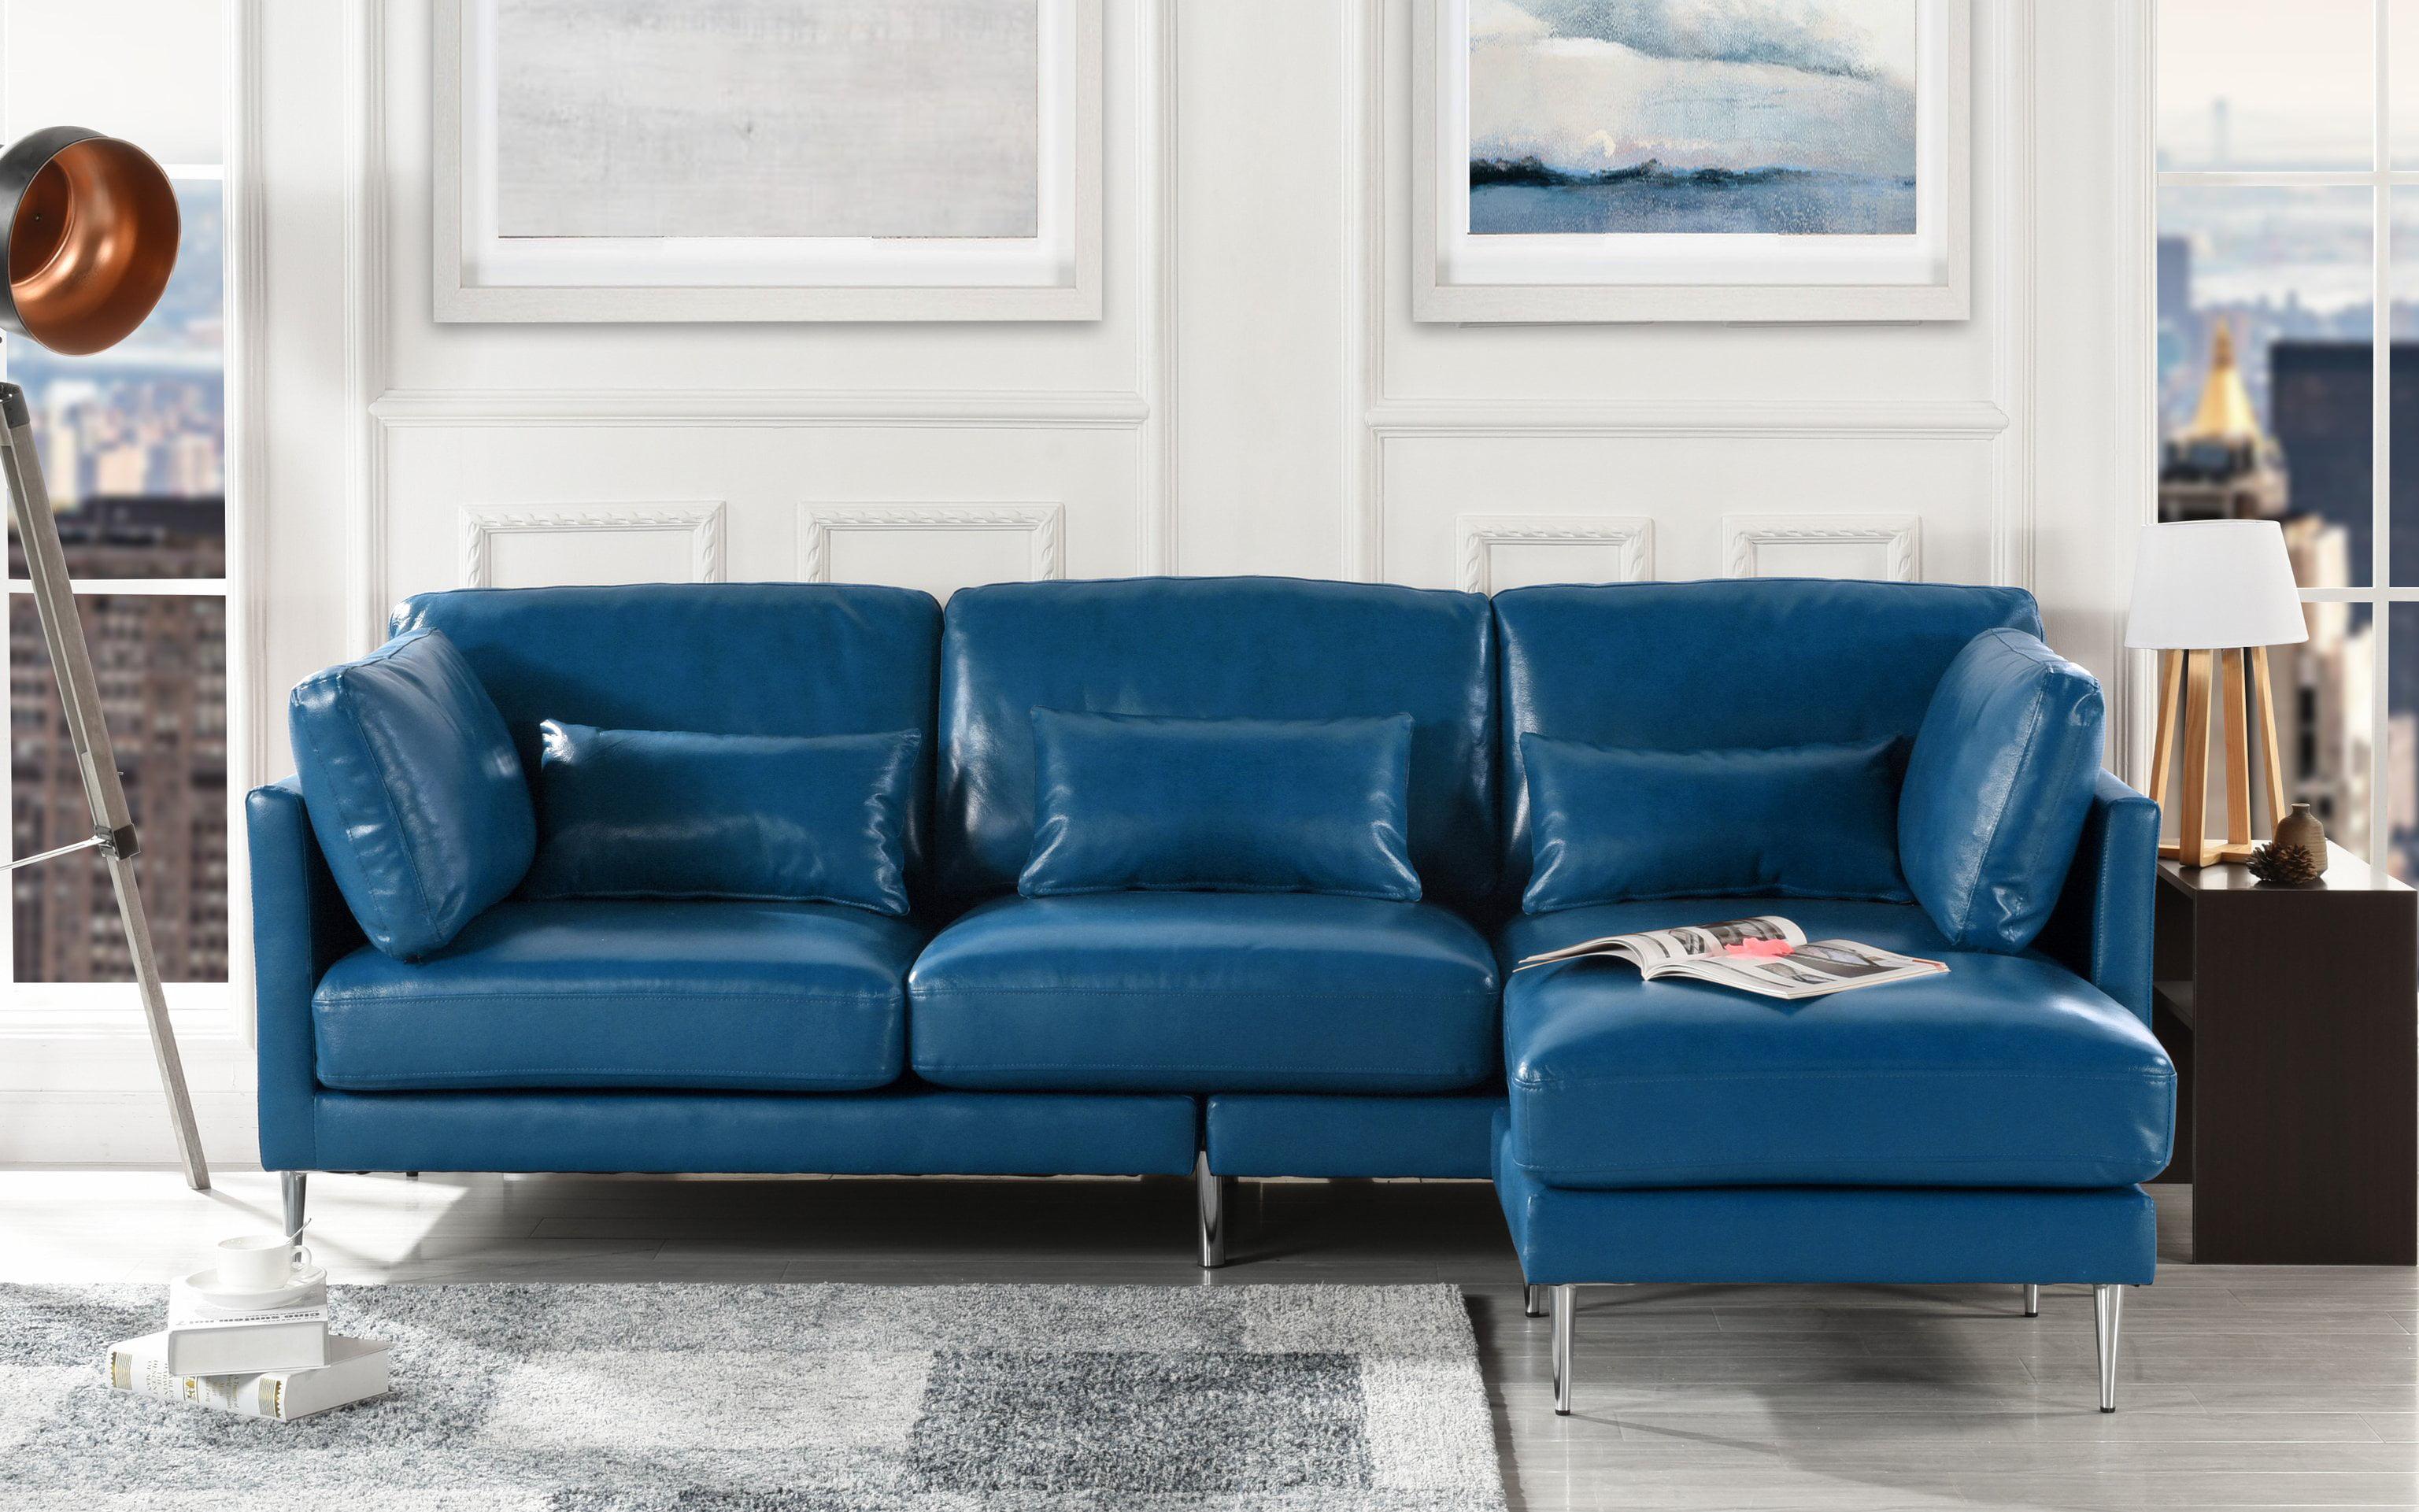 Modern Leather Sectional Sofa L Shape Couch Navy Blue Walmart Com Walmart Com